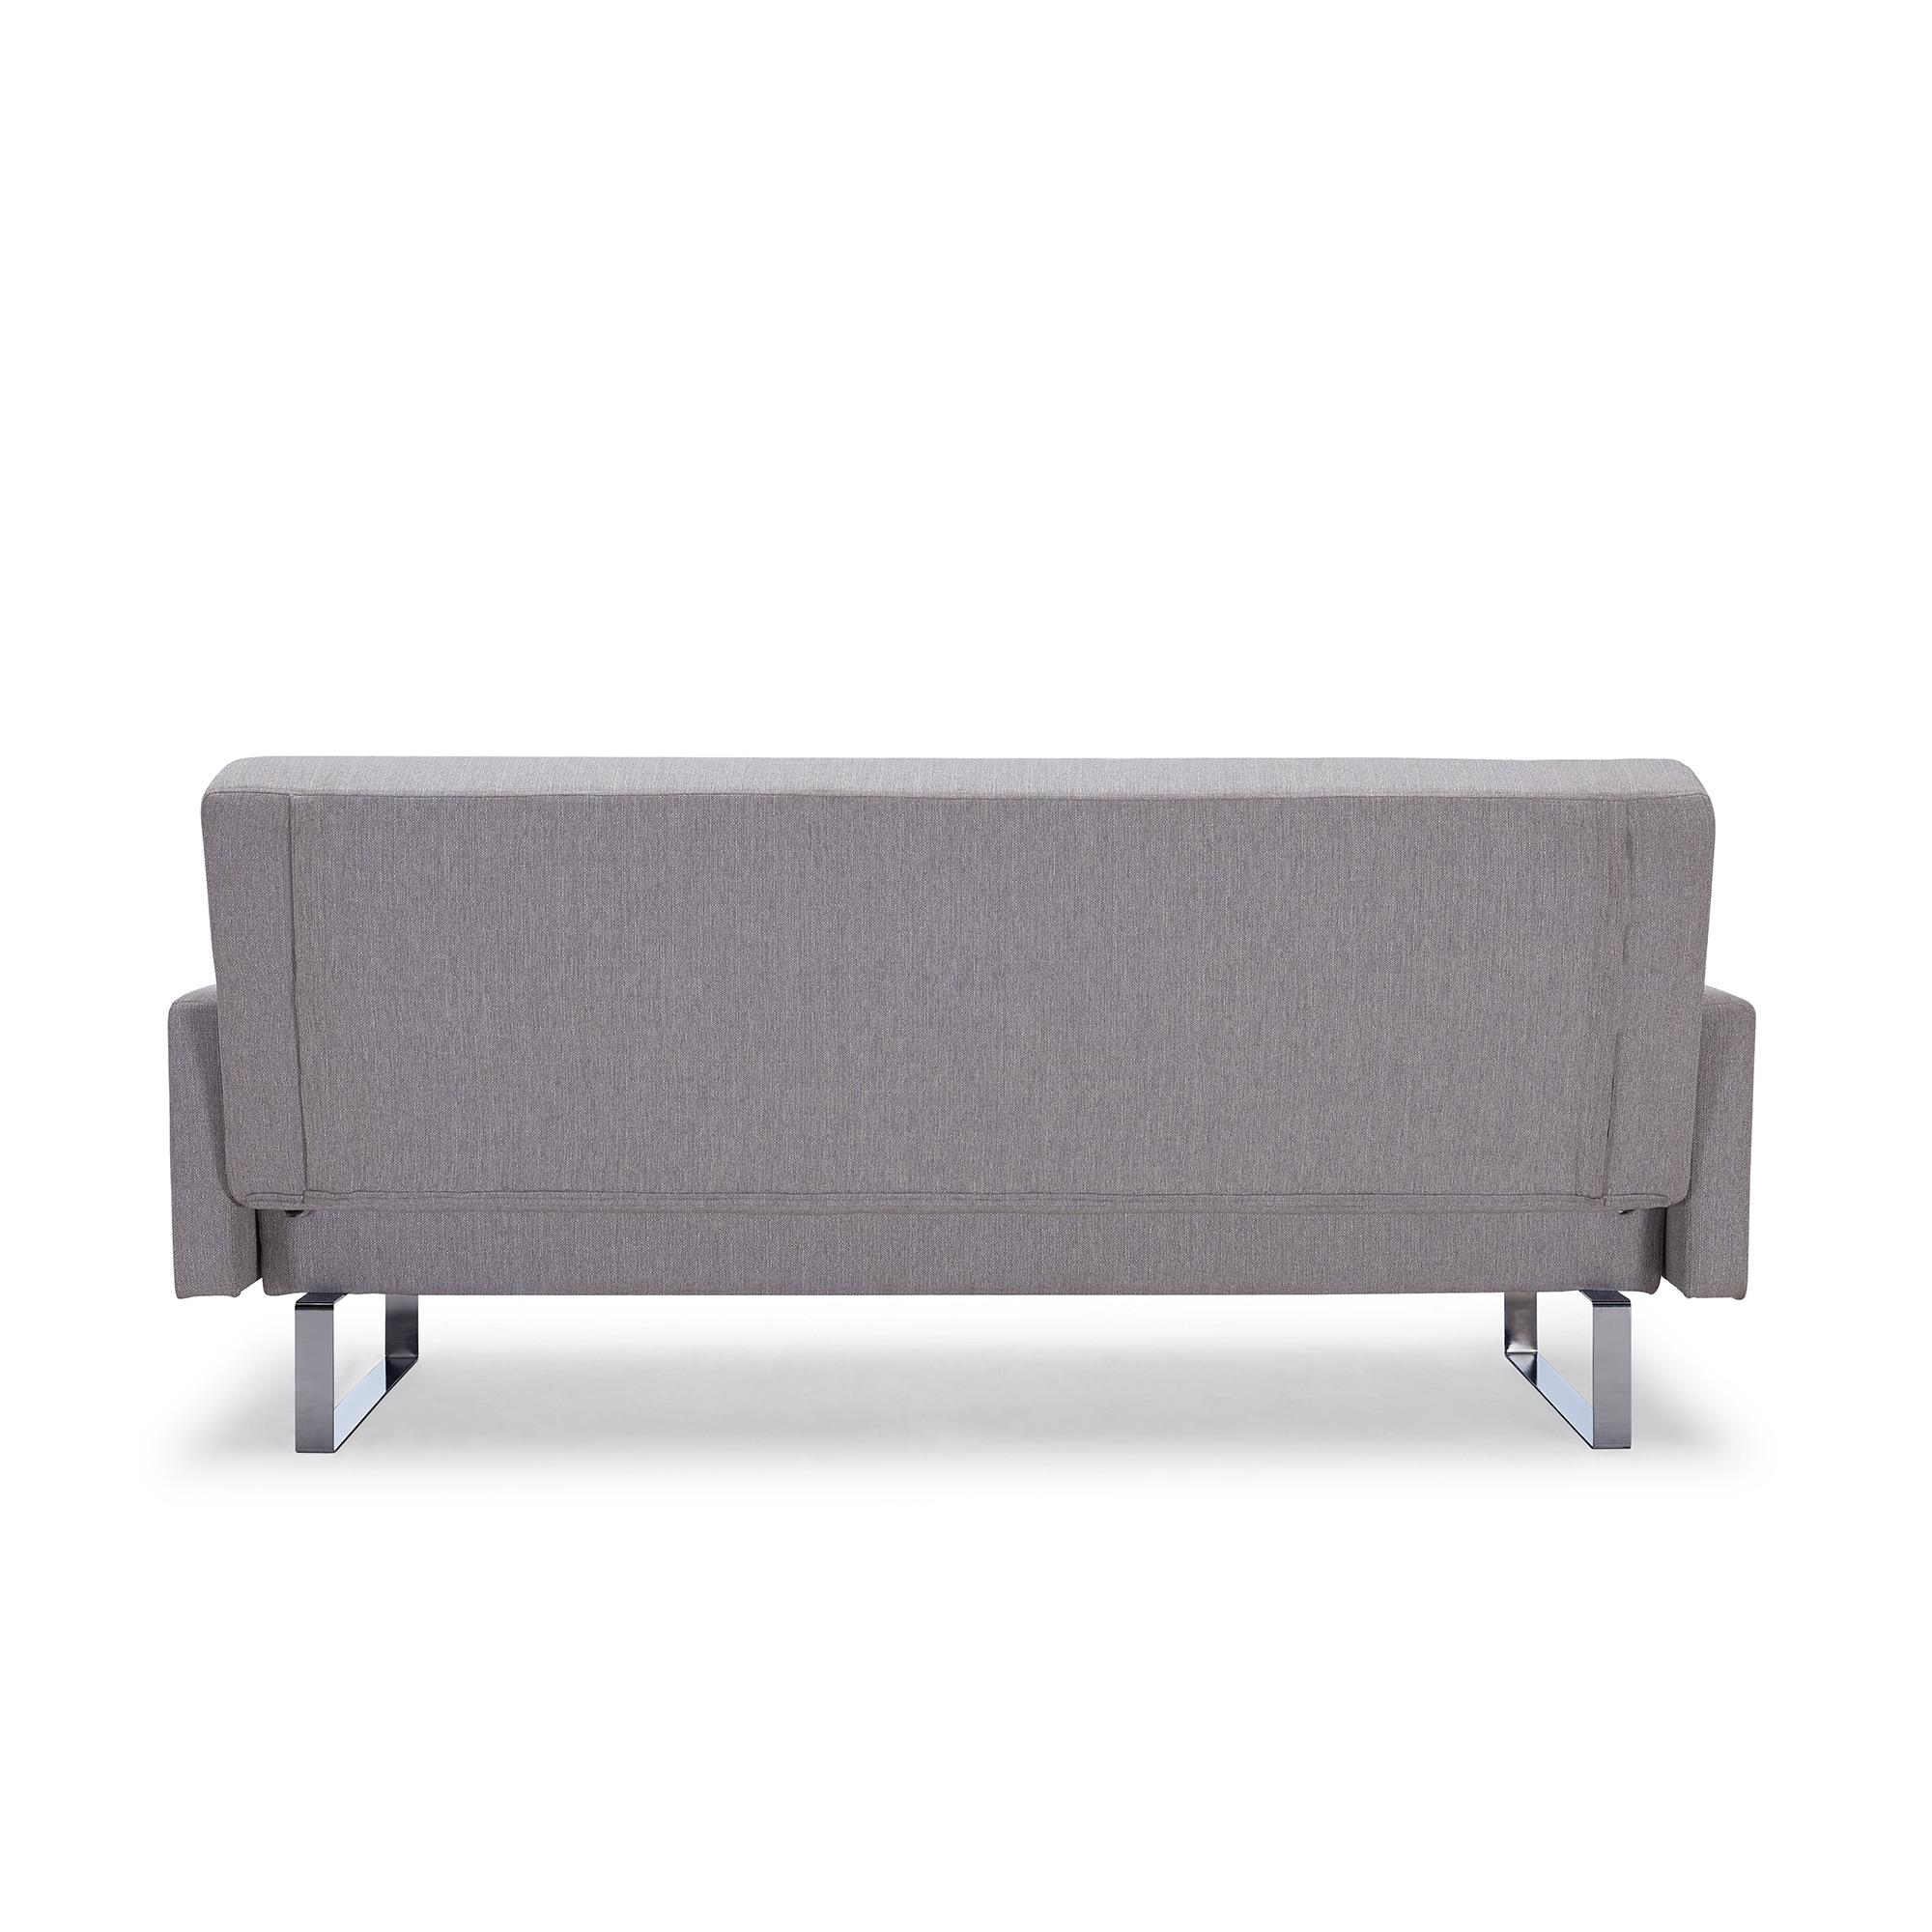 Shop Handy Living Springfield Dove Grey Linen Click Clack Futon Sofa